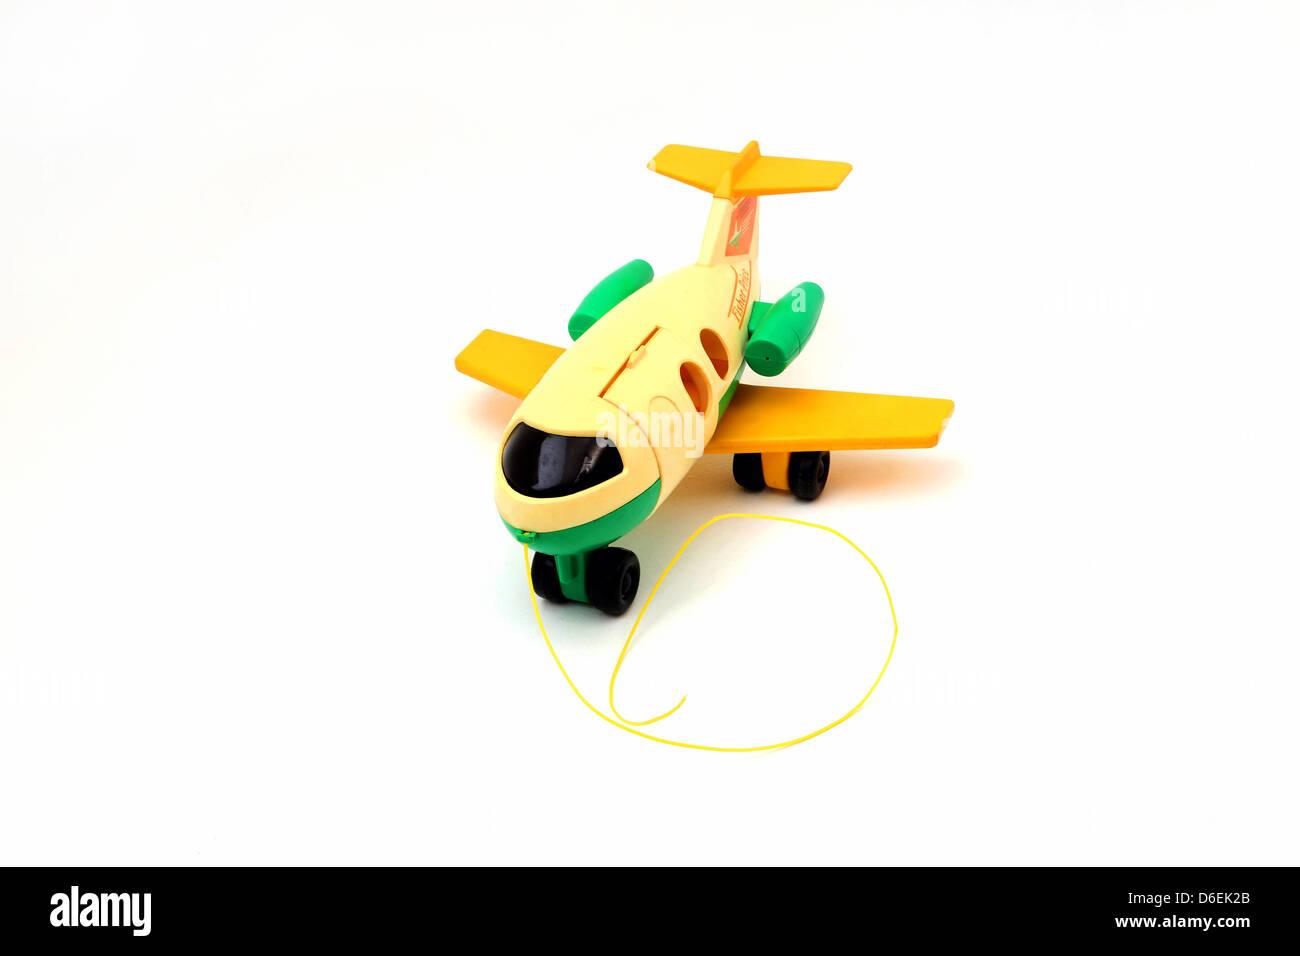 Fisher price pull along aeroplane toy stock photo royalty free fisher price pull along aeroplane toy buycottarizona